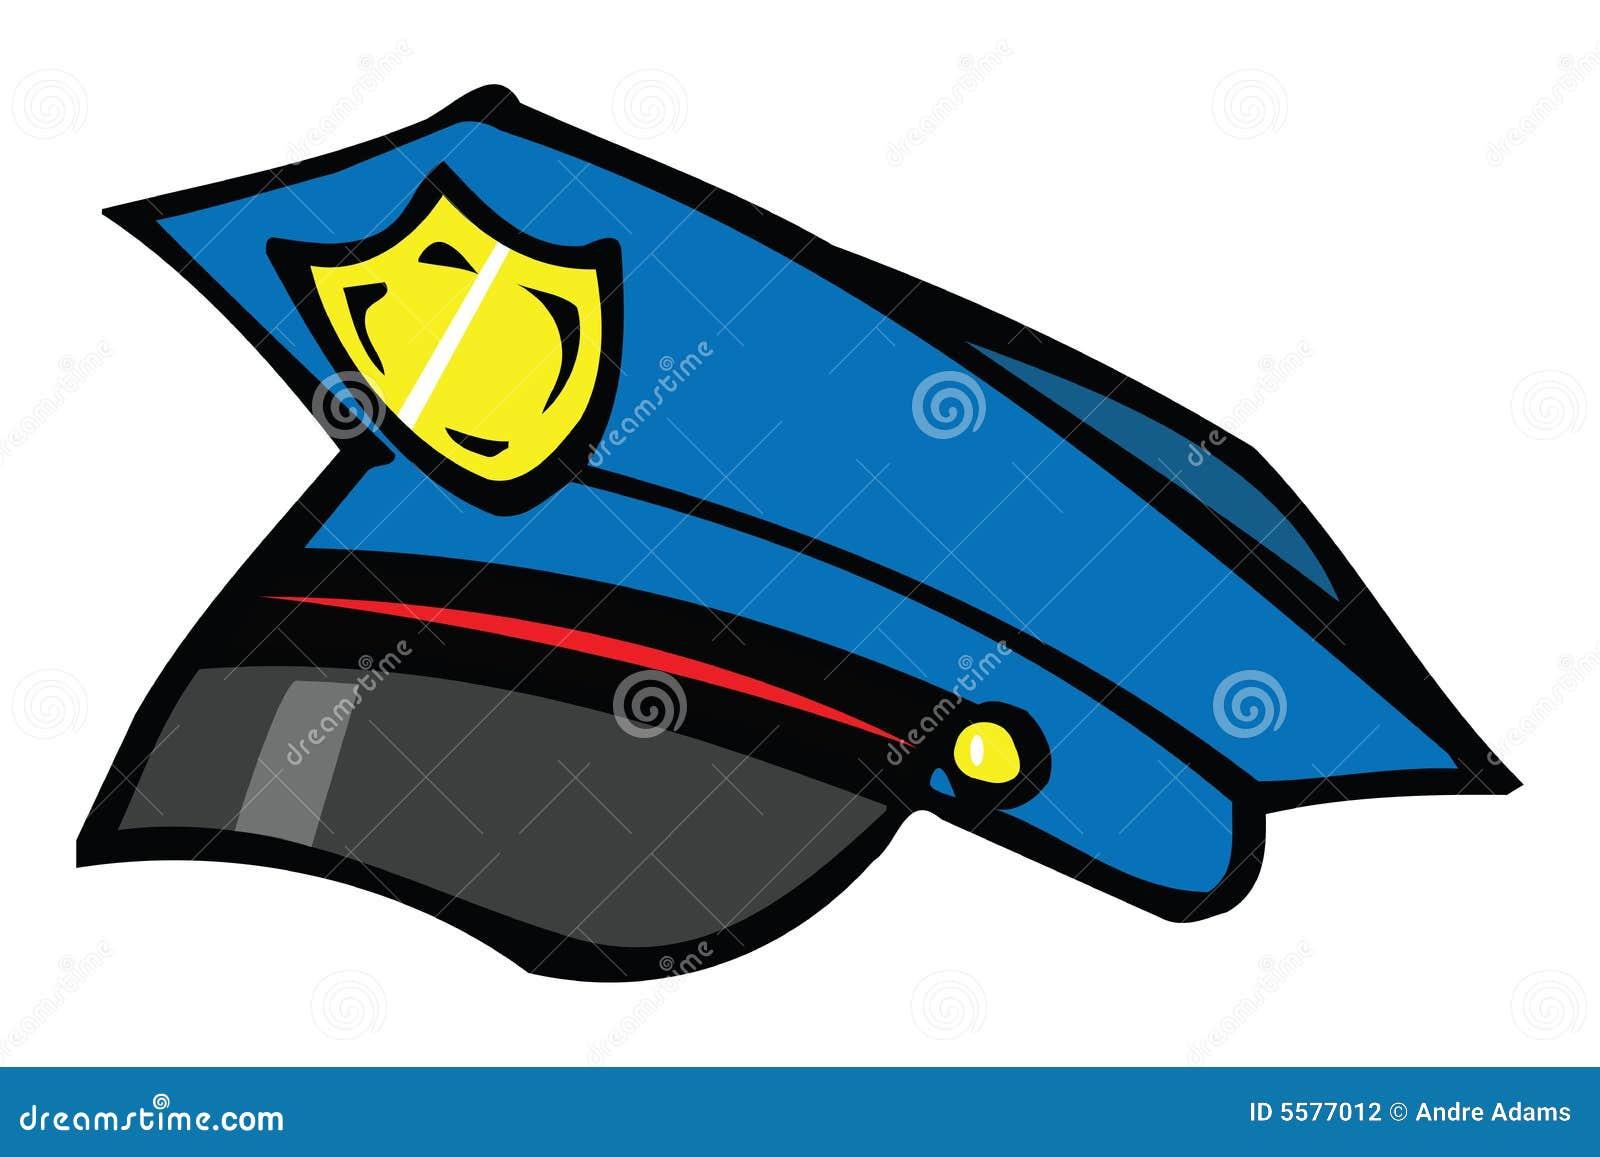 Police Cap Stock Illustration. Illustration Of Officer